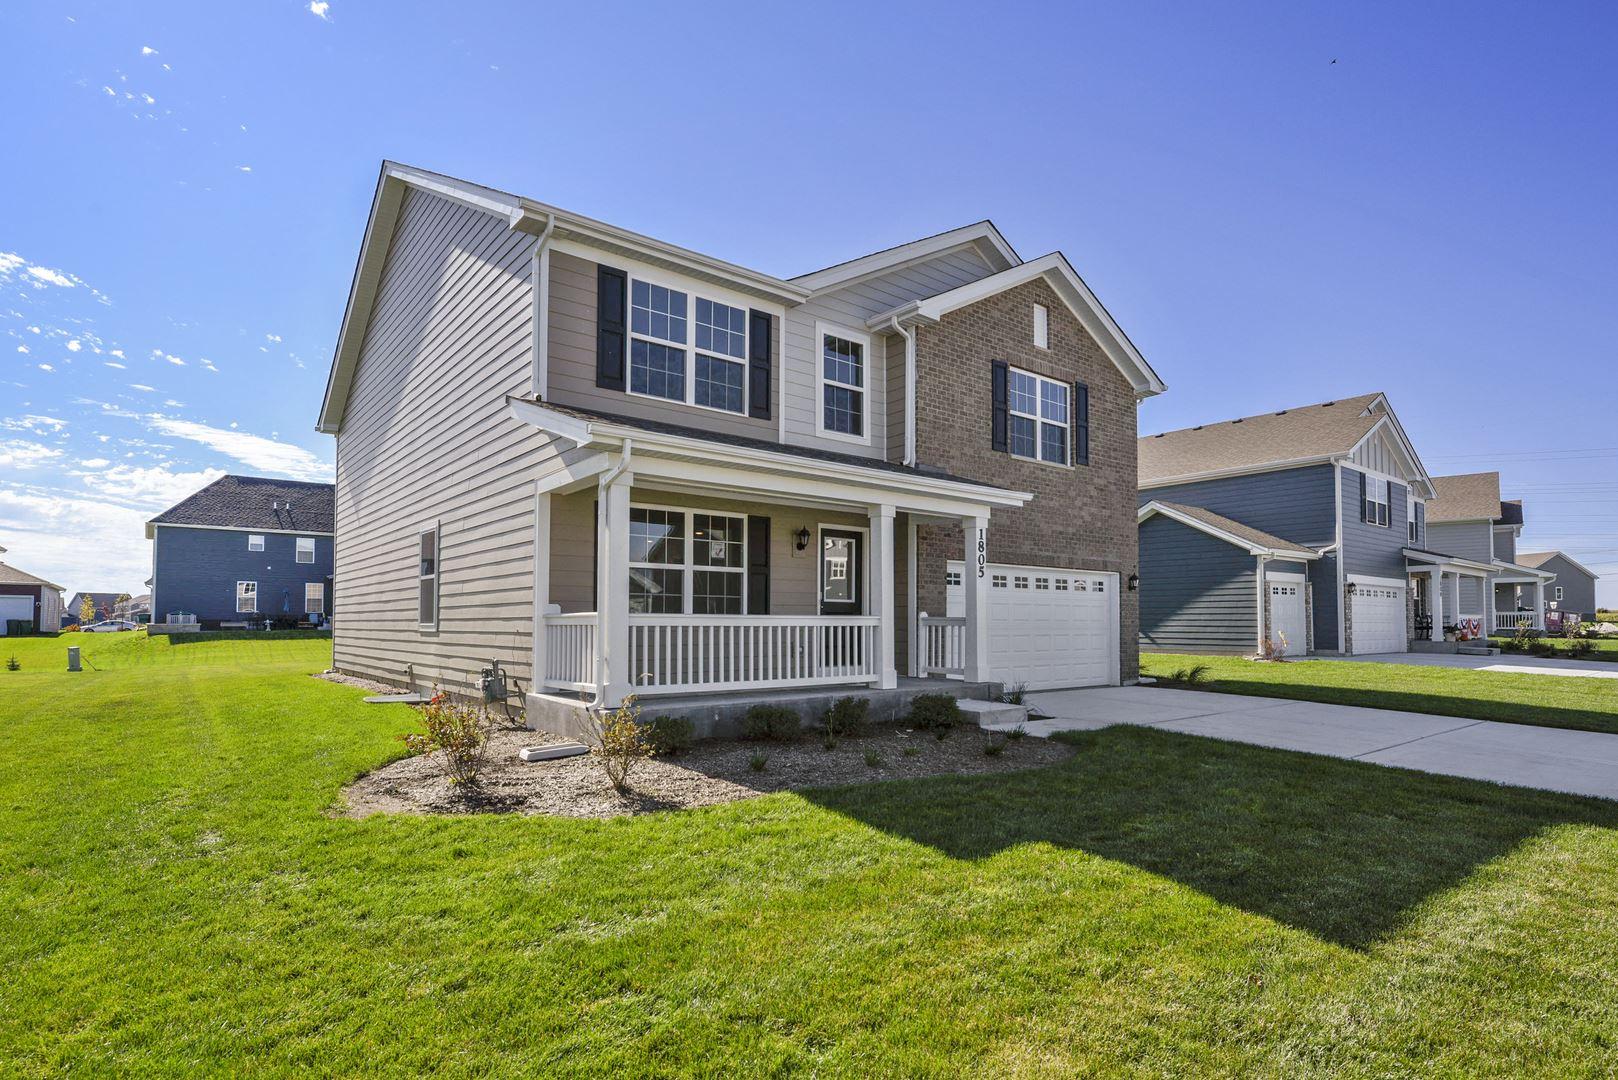 Photo of 1828 Peyton Terrace, Shorewood, IL 60404 (MLS # 11035386)